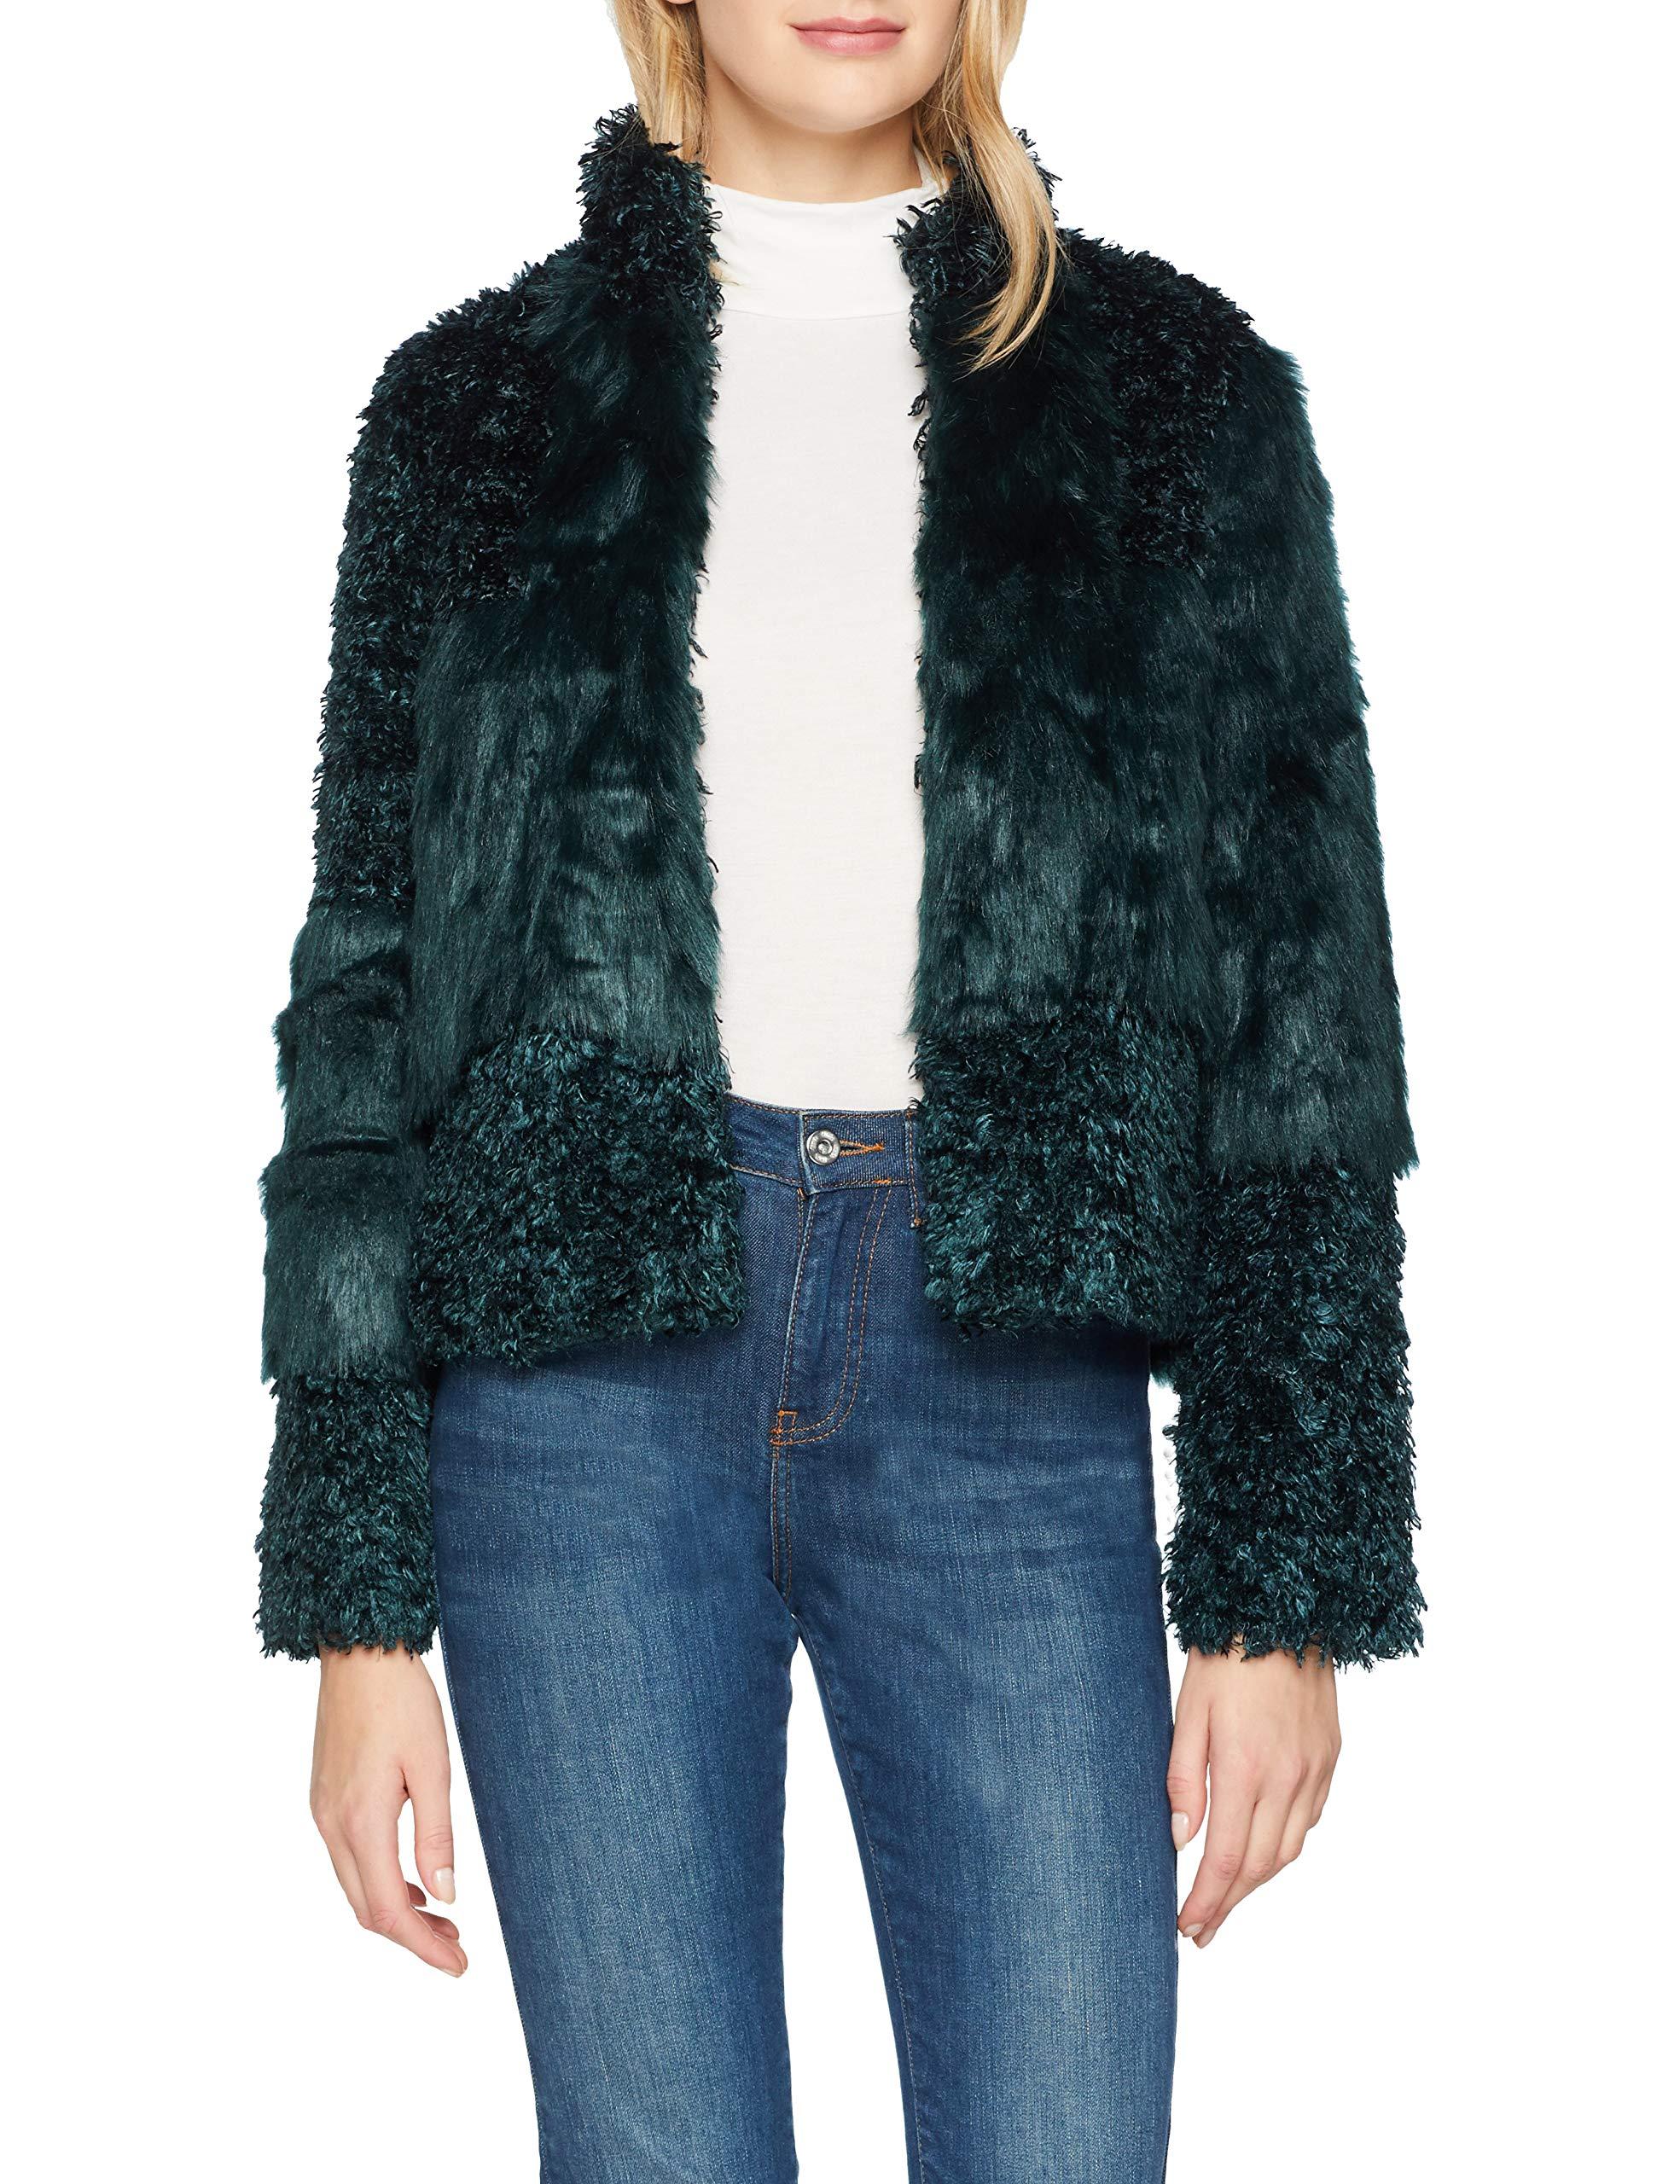 6128448 Cassie Jacket Cream BomberVertfall Fur Femme Green BoerCdx